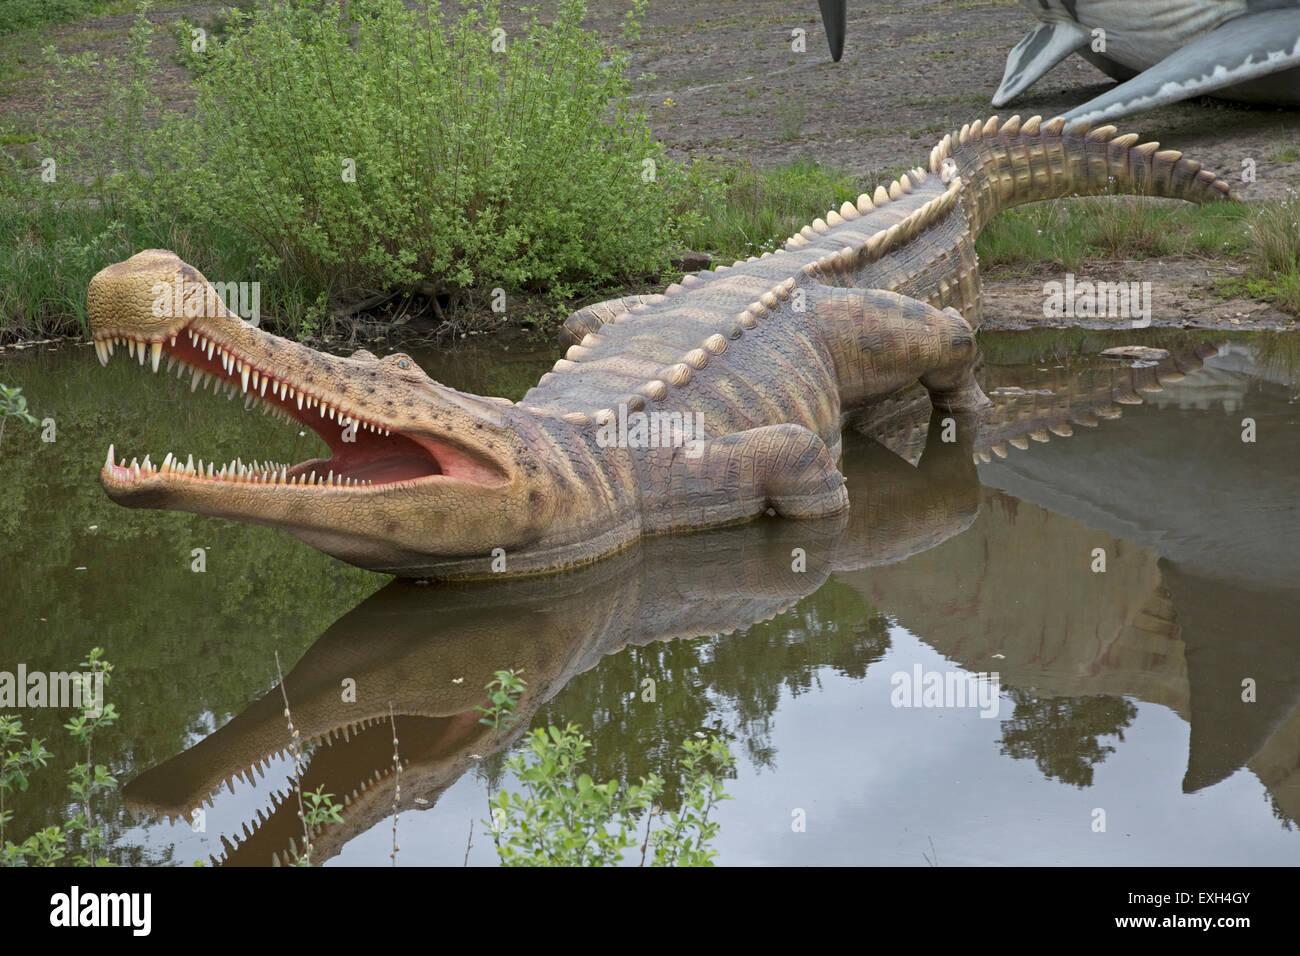 Sarcosuchus an extinct giant crocodile of Cretaceous Dinosaurier Park Germany - Stock Image